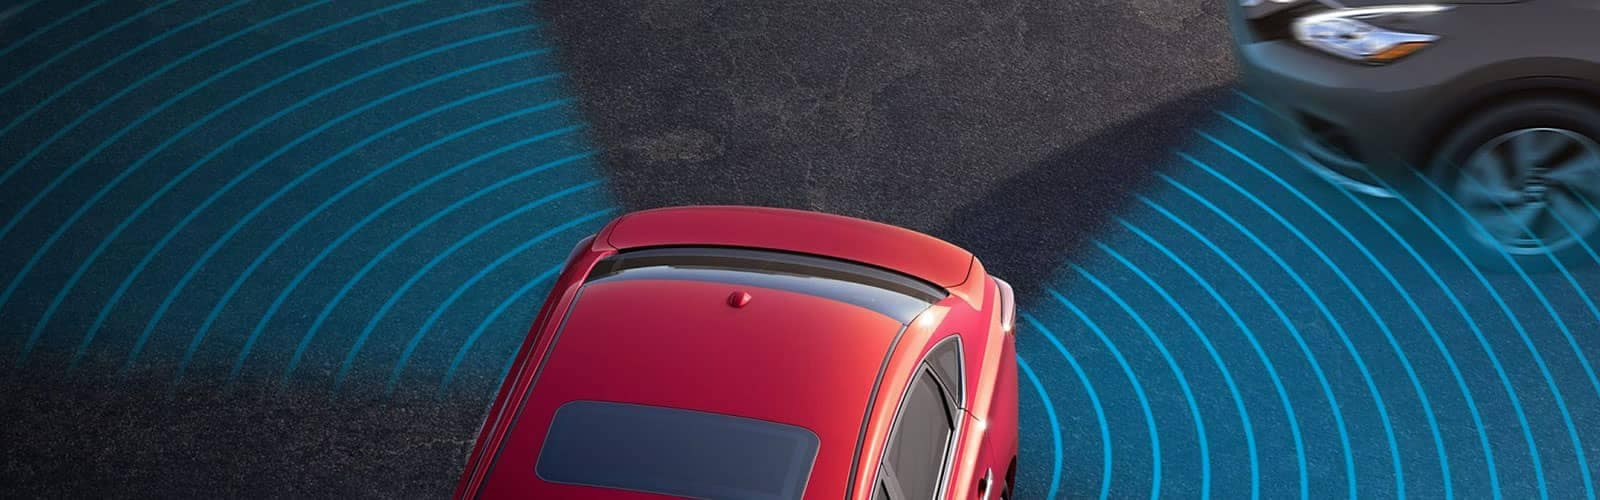 2018 Nissan Sedan Safety